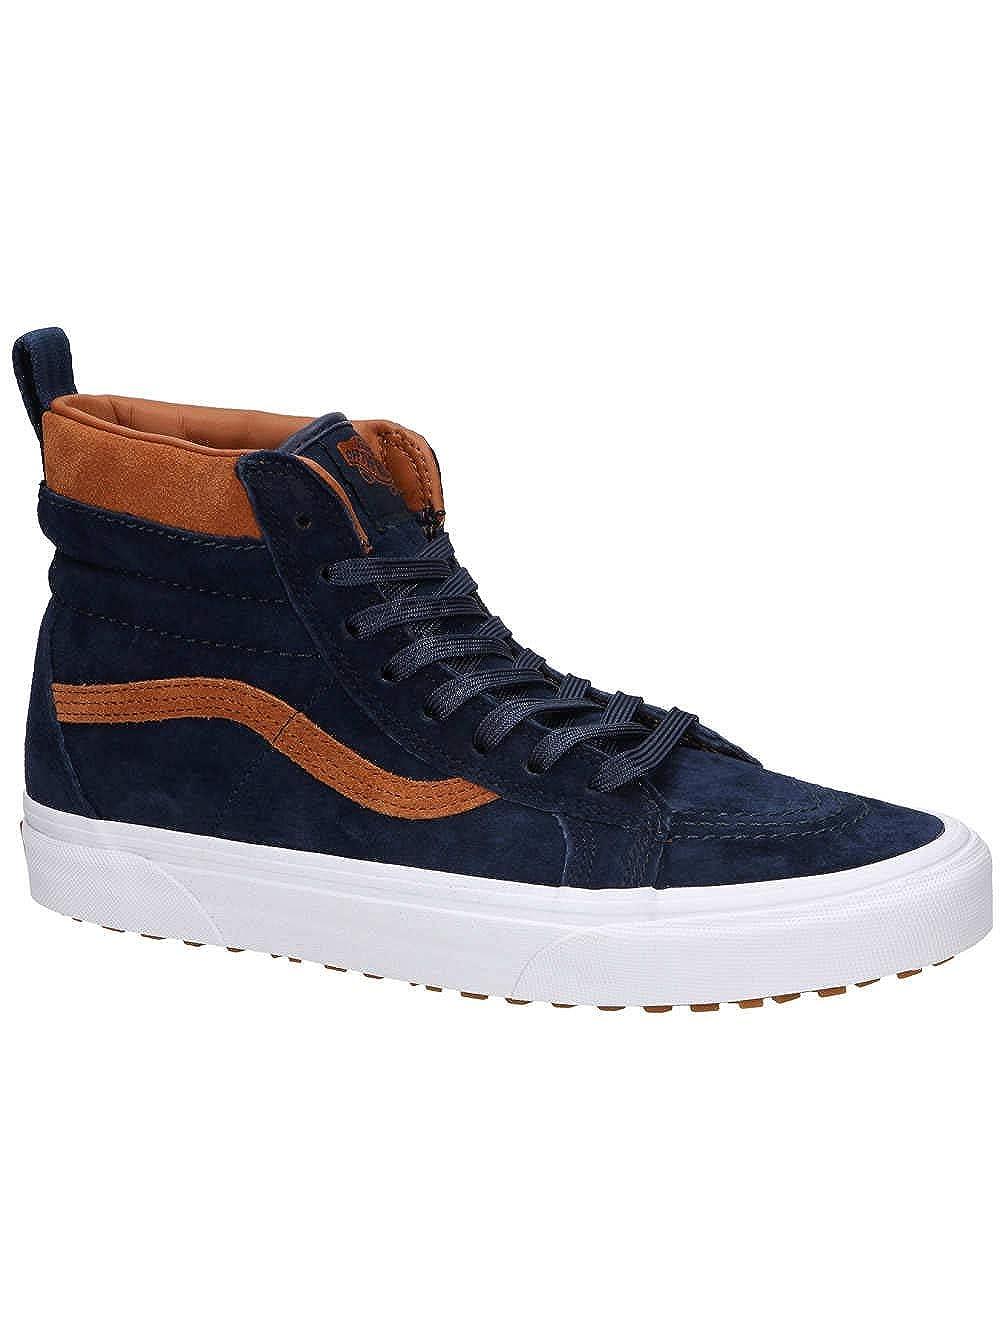 b39ab6b056c3 Amazon.com  Vans Classic SK8-HI MTE Sneaker Skate Leather Winterboots  VN0A33TXUCB Blue  Shoes